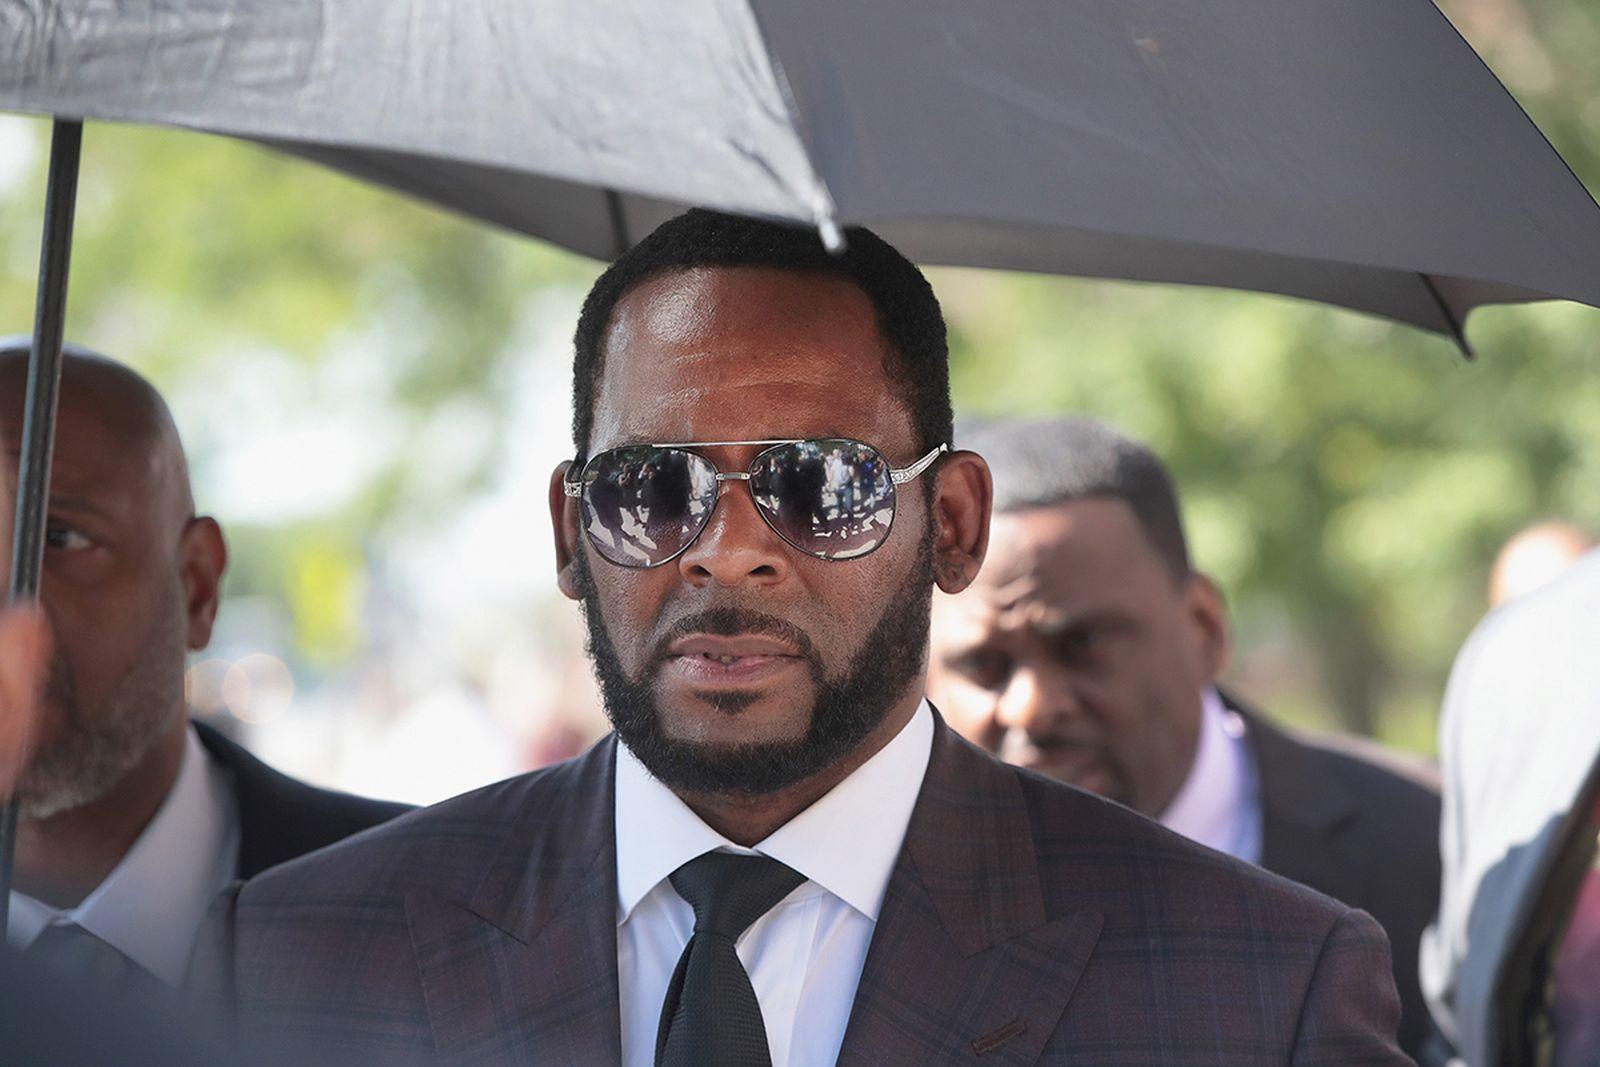 R. Kelly suit tie sunglasses